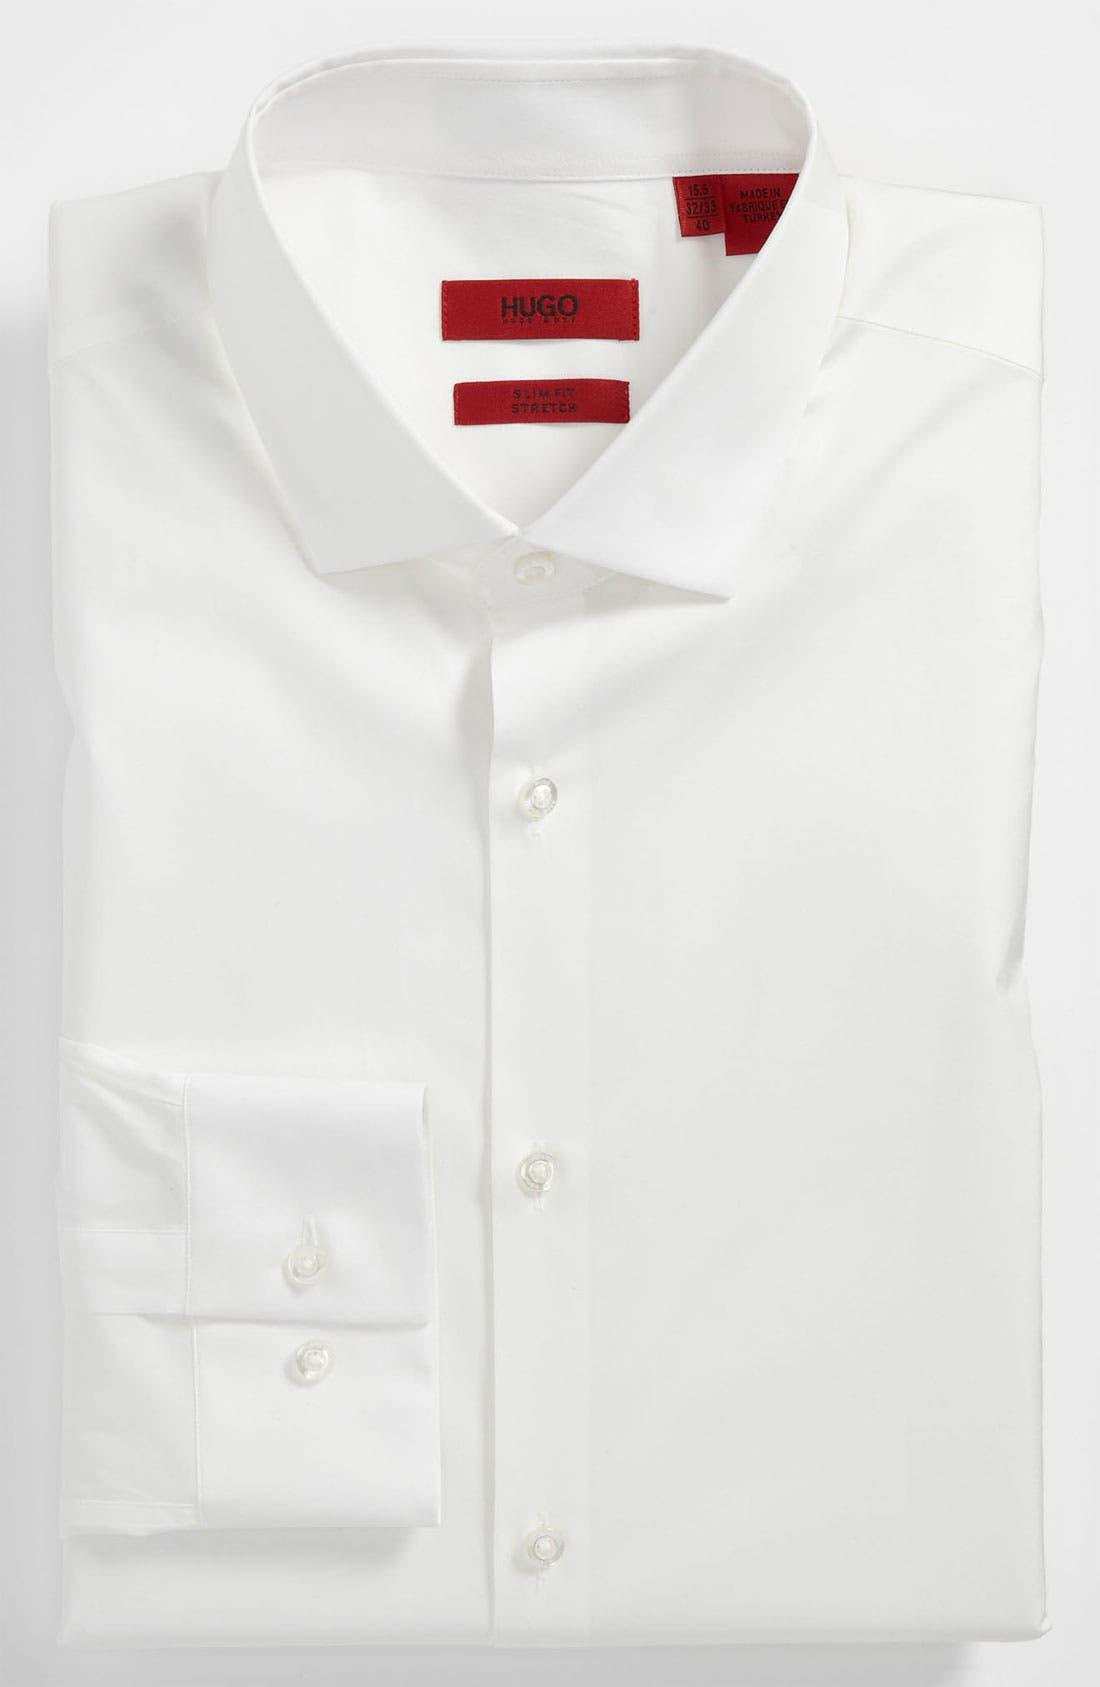 Main Image - HUGO Slim Fit Cotton Stretch Dress Shirt